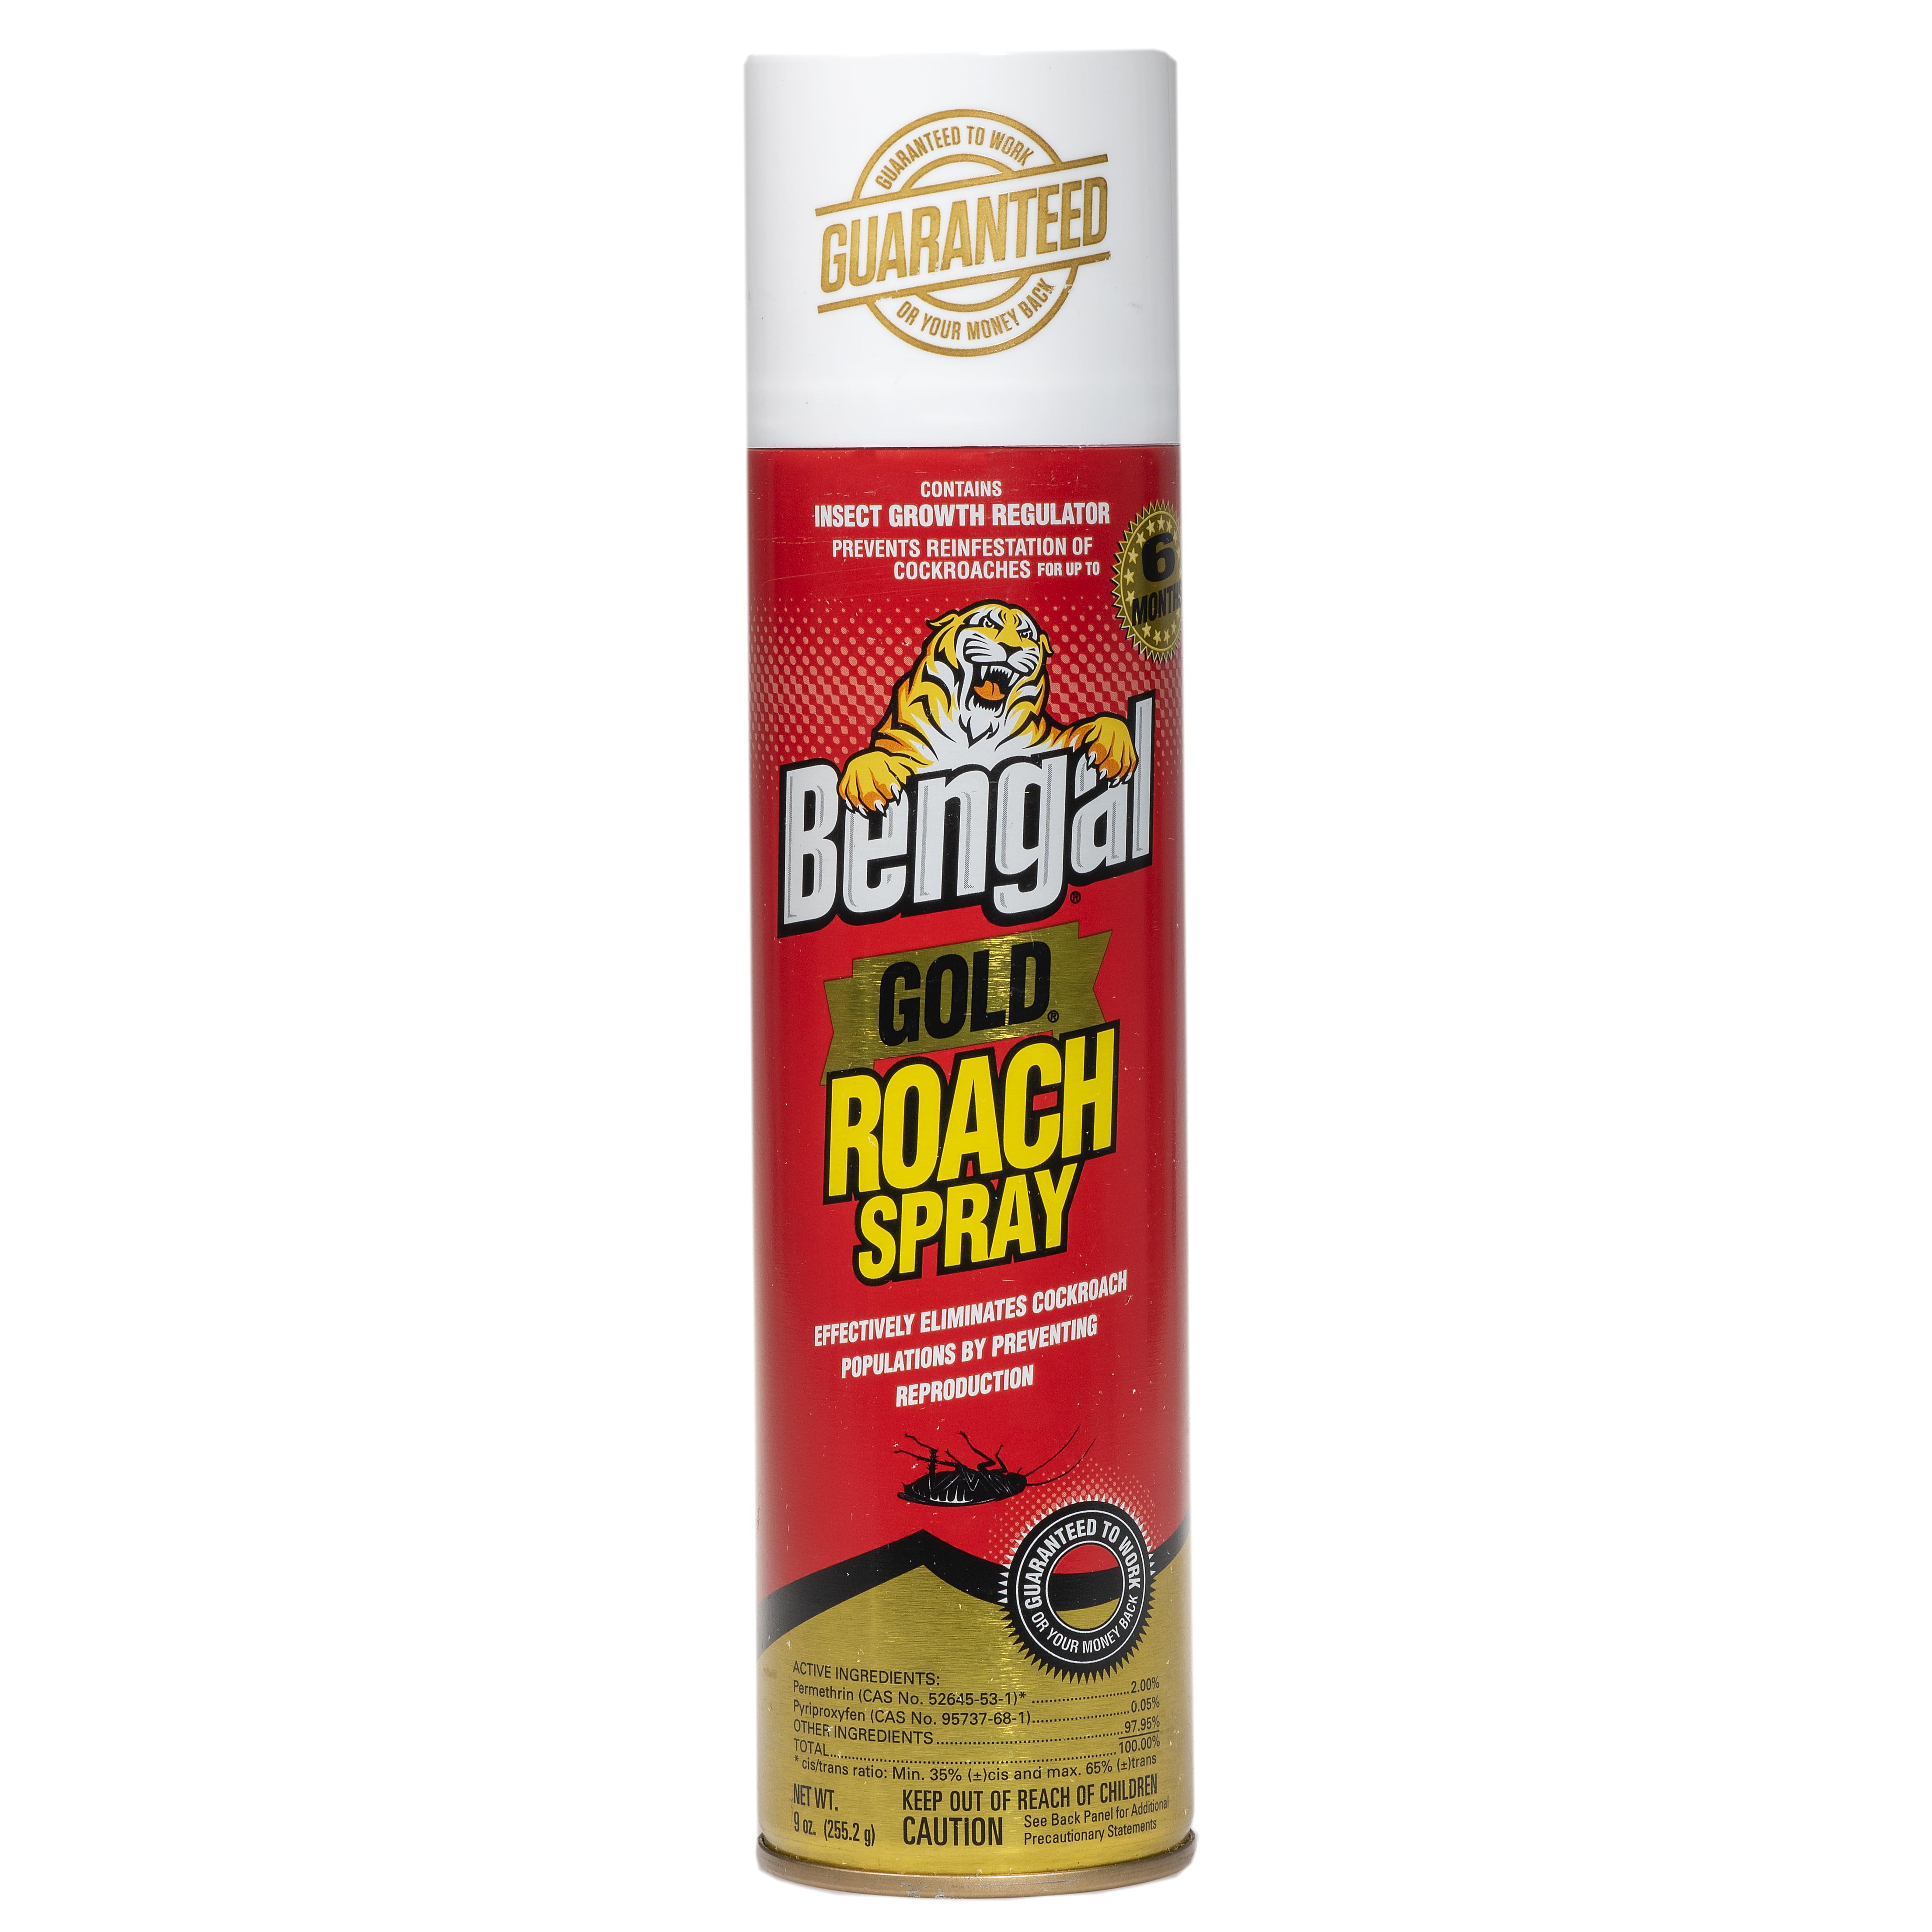 Bengal Gold Roach Spray 9 oz